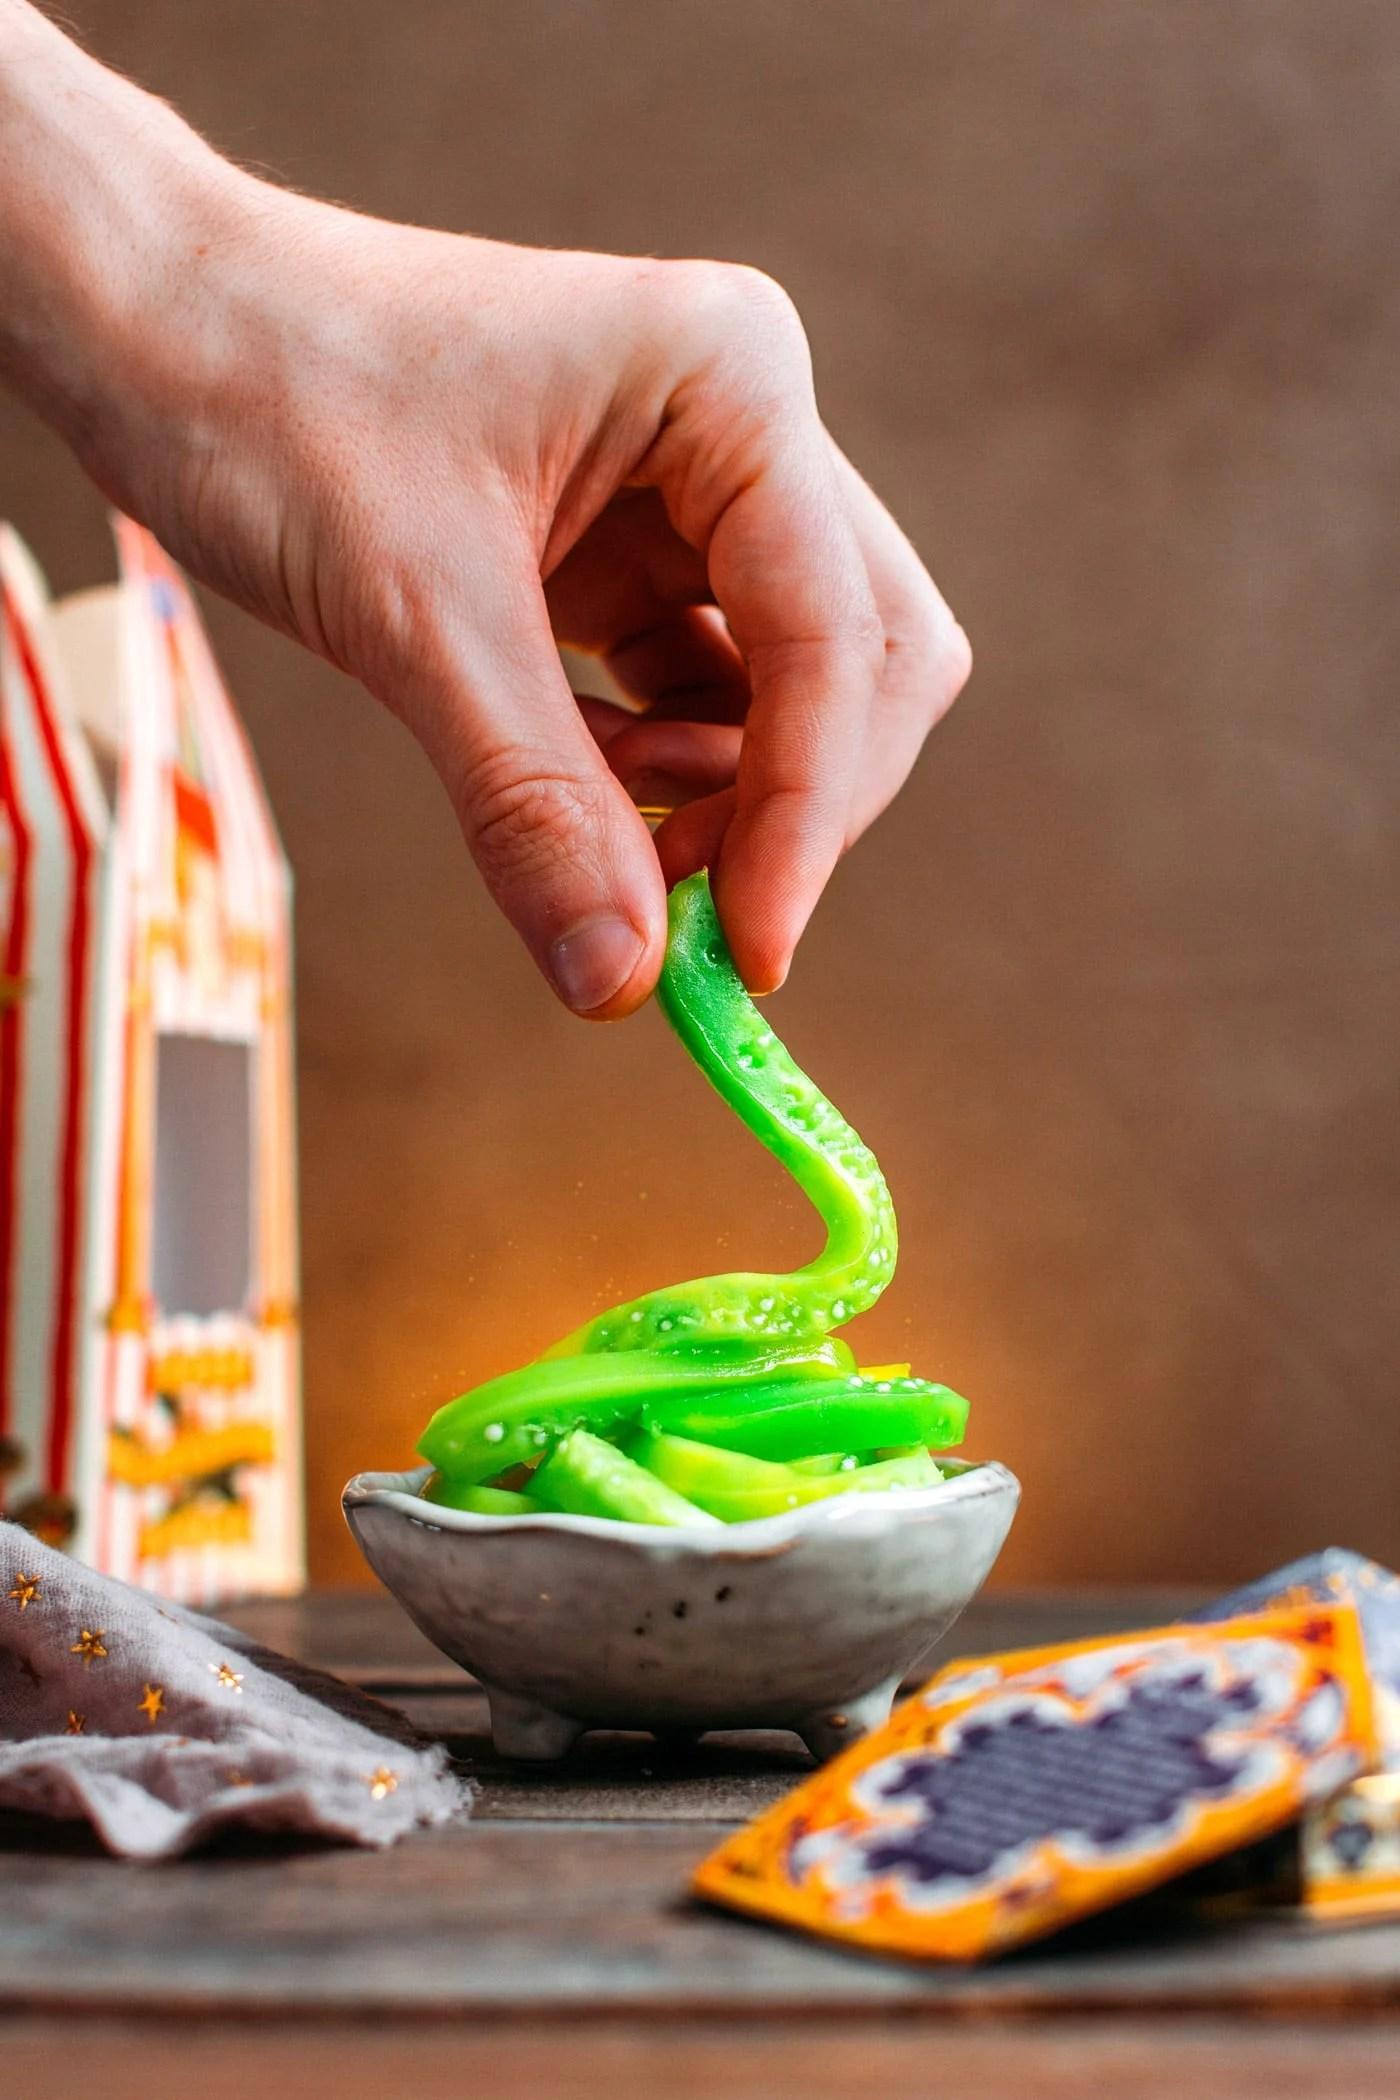 Honeydukes' Green Worms